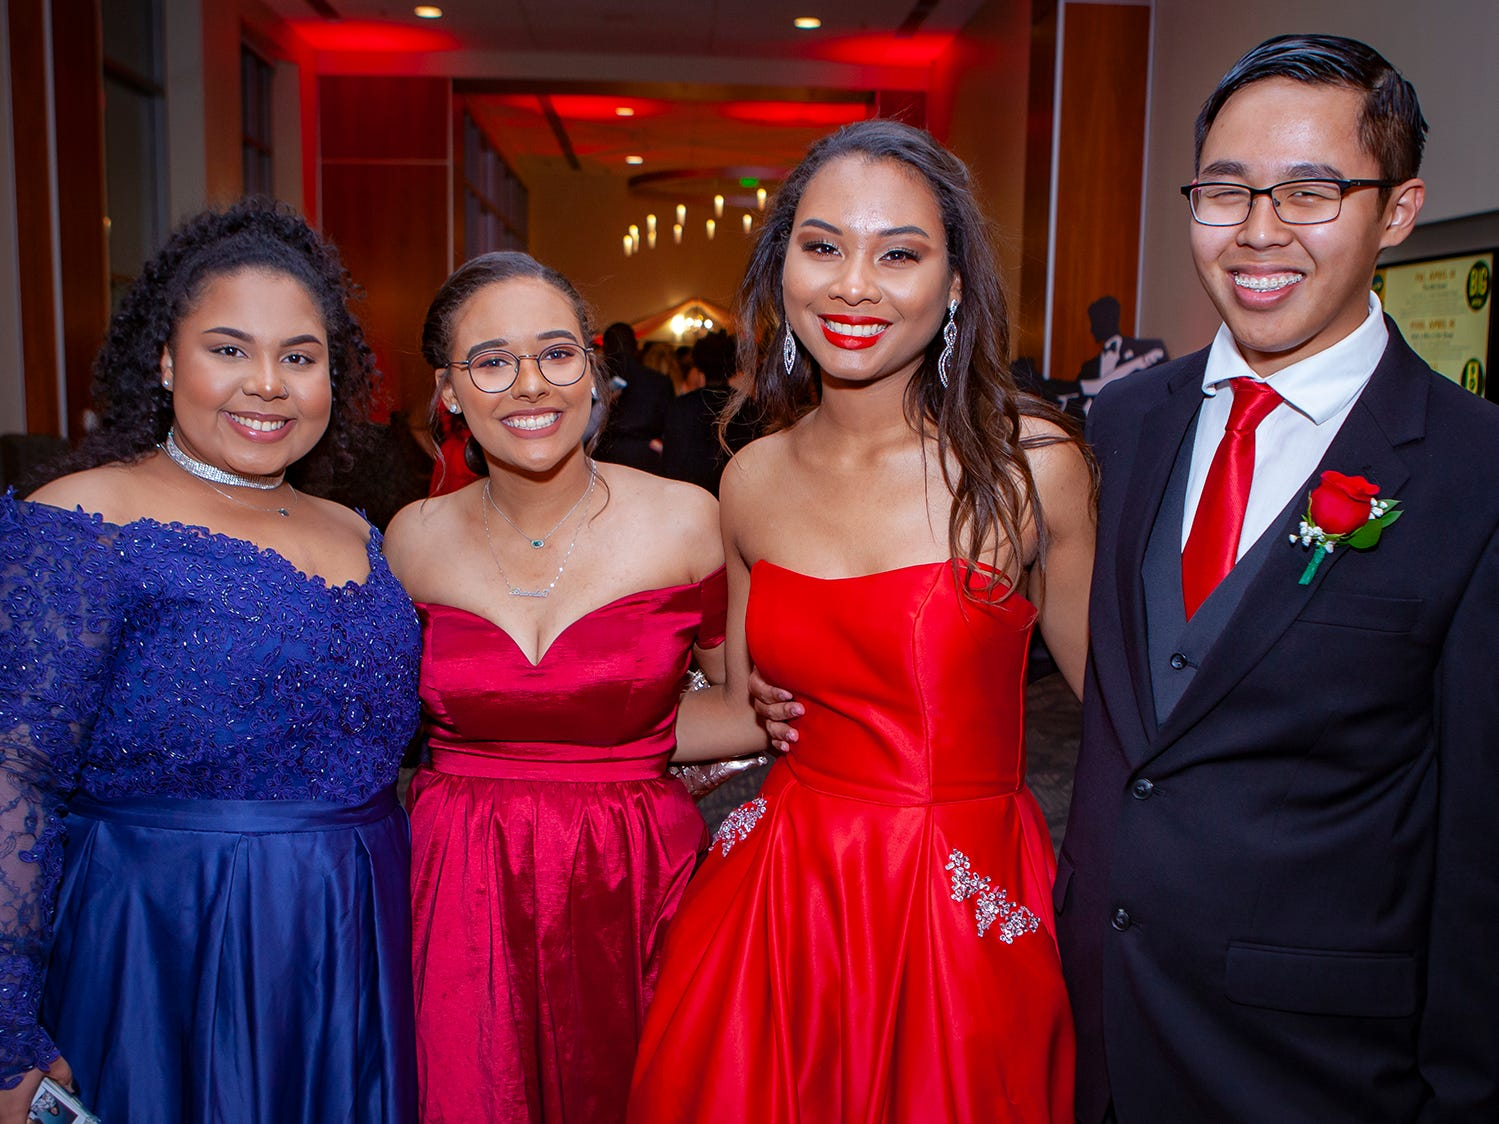 Briah Kilmartin, Cassidy Wright, Cheynne Robertson and Kevin Sisavang at Riverdale's prom, held Saturday, April 27, 2019 at MTSU's Student Union Building.